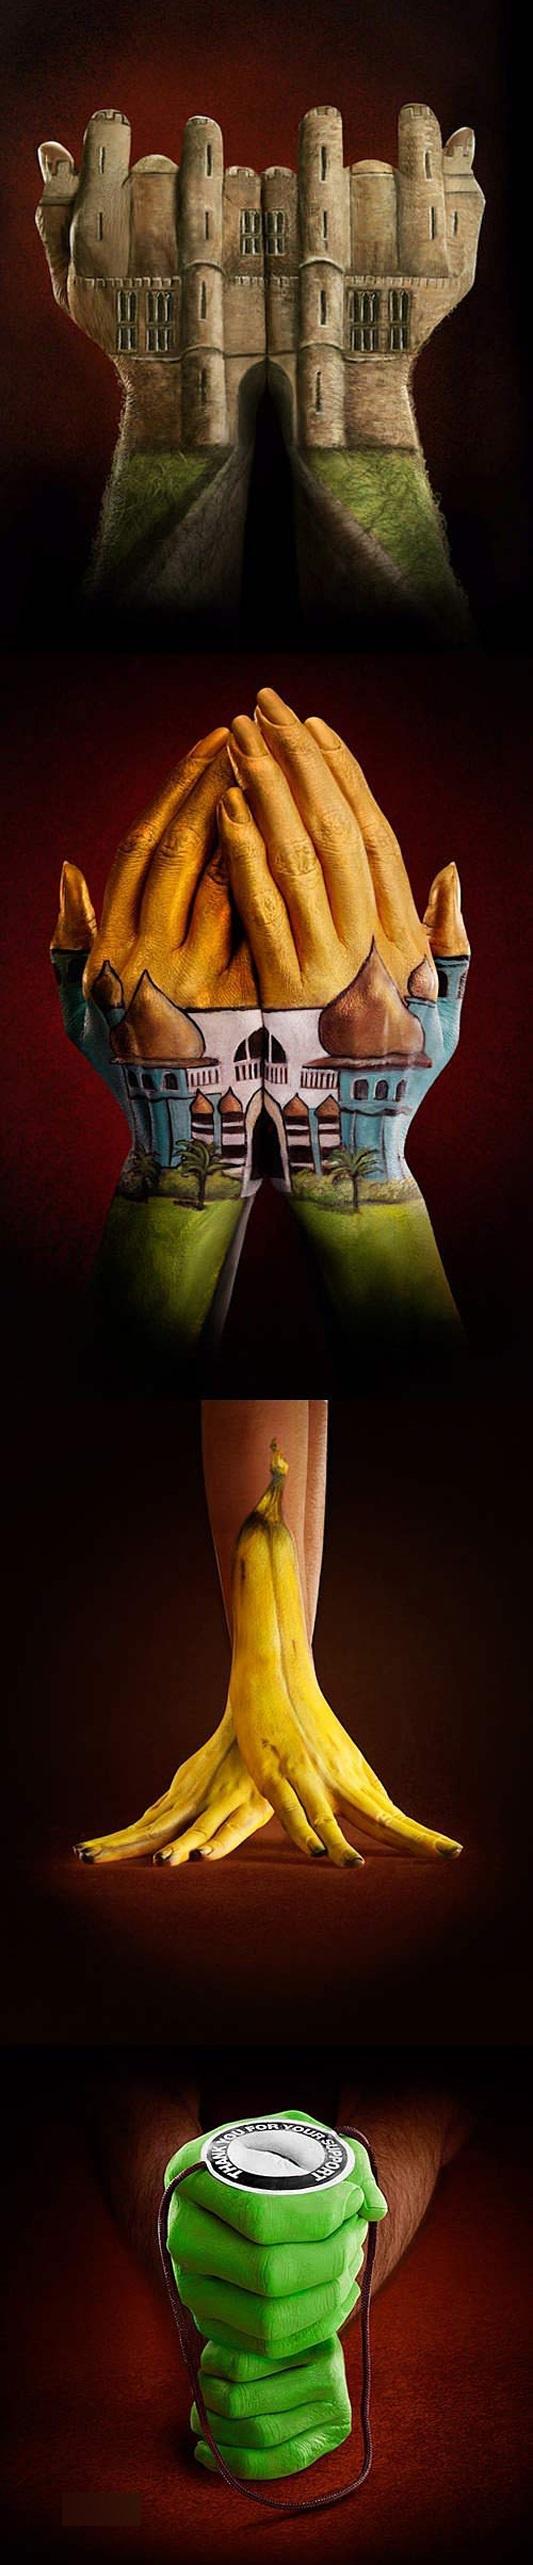 best art images on pinterest photographs art illustrations and